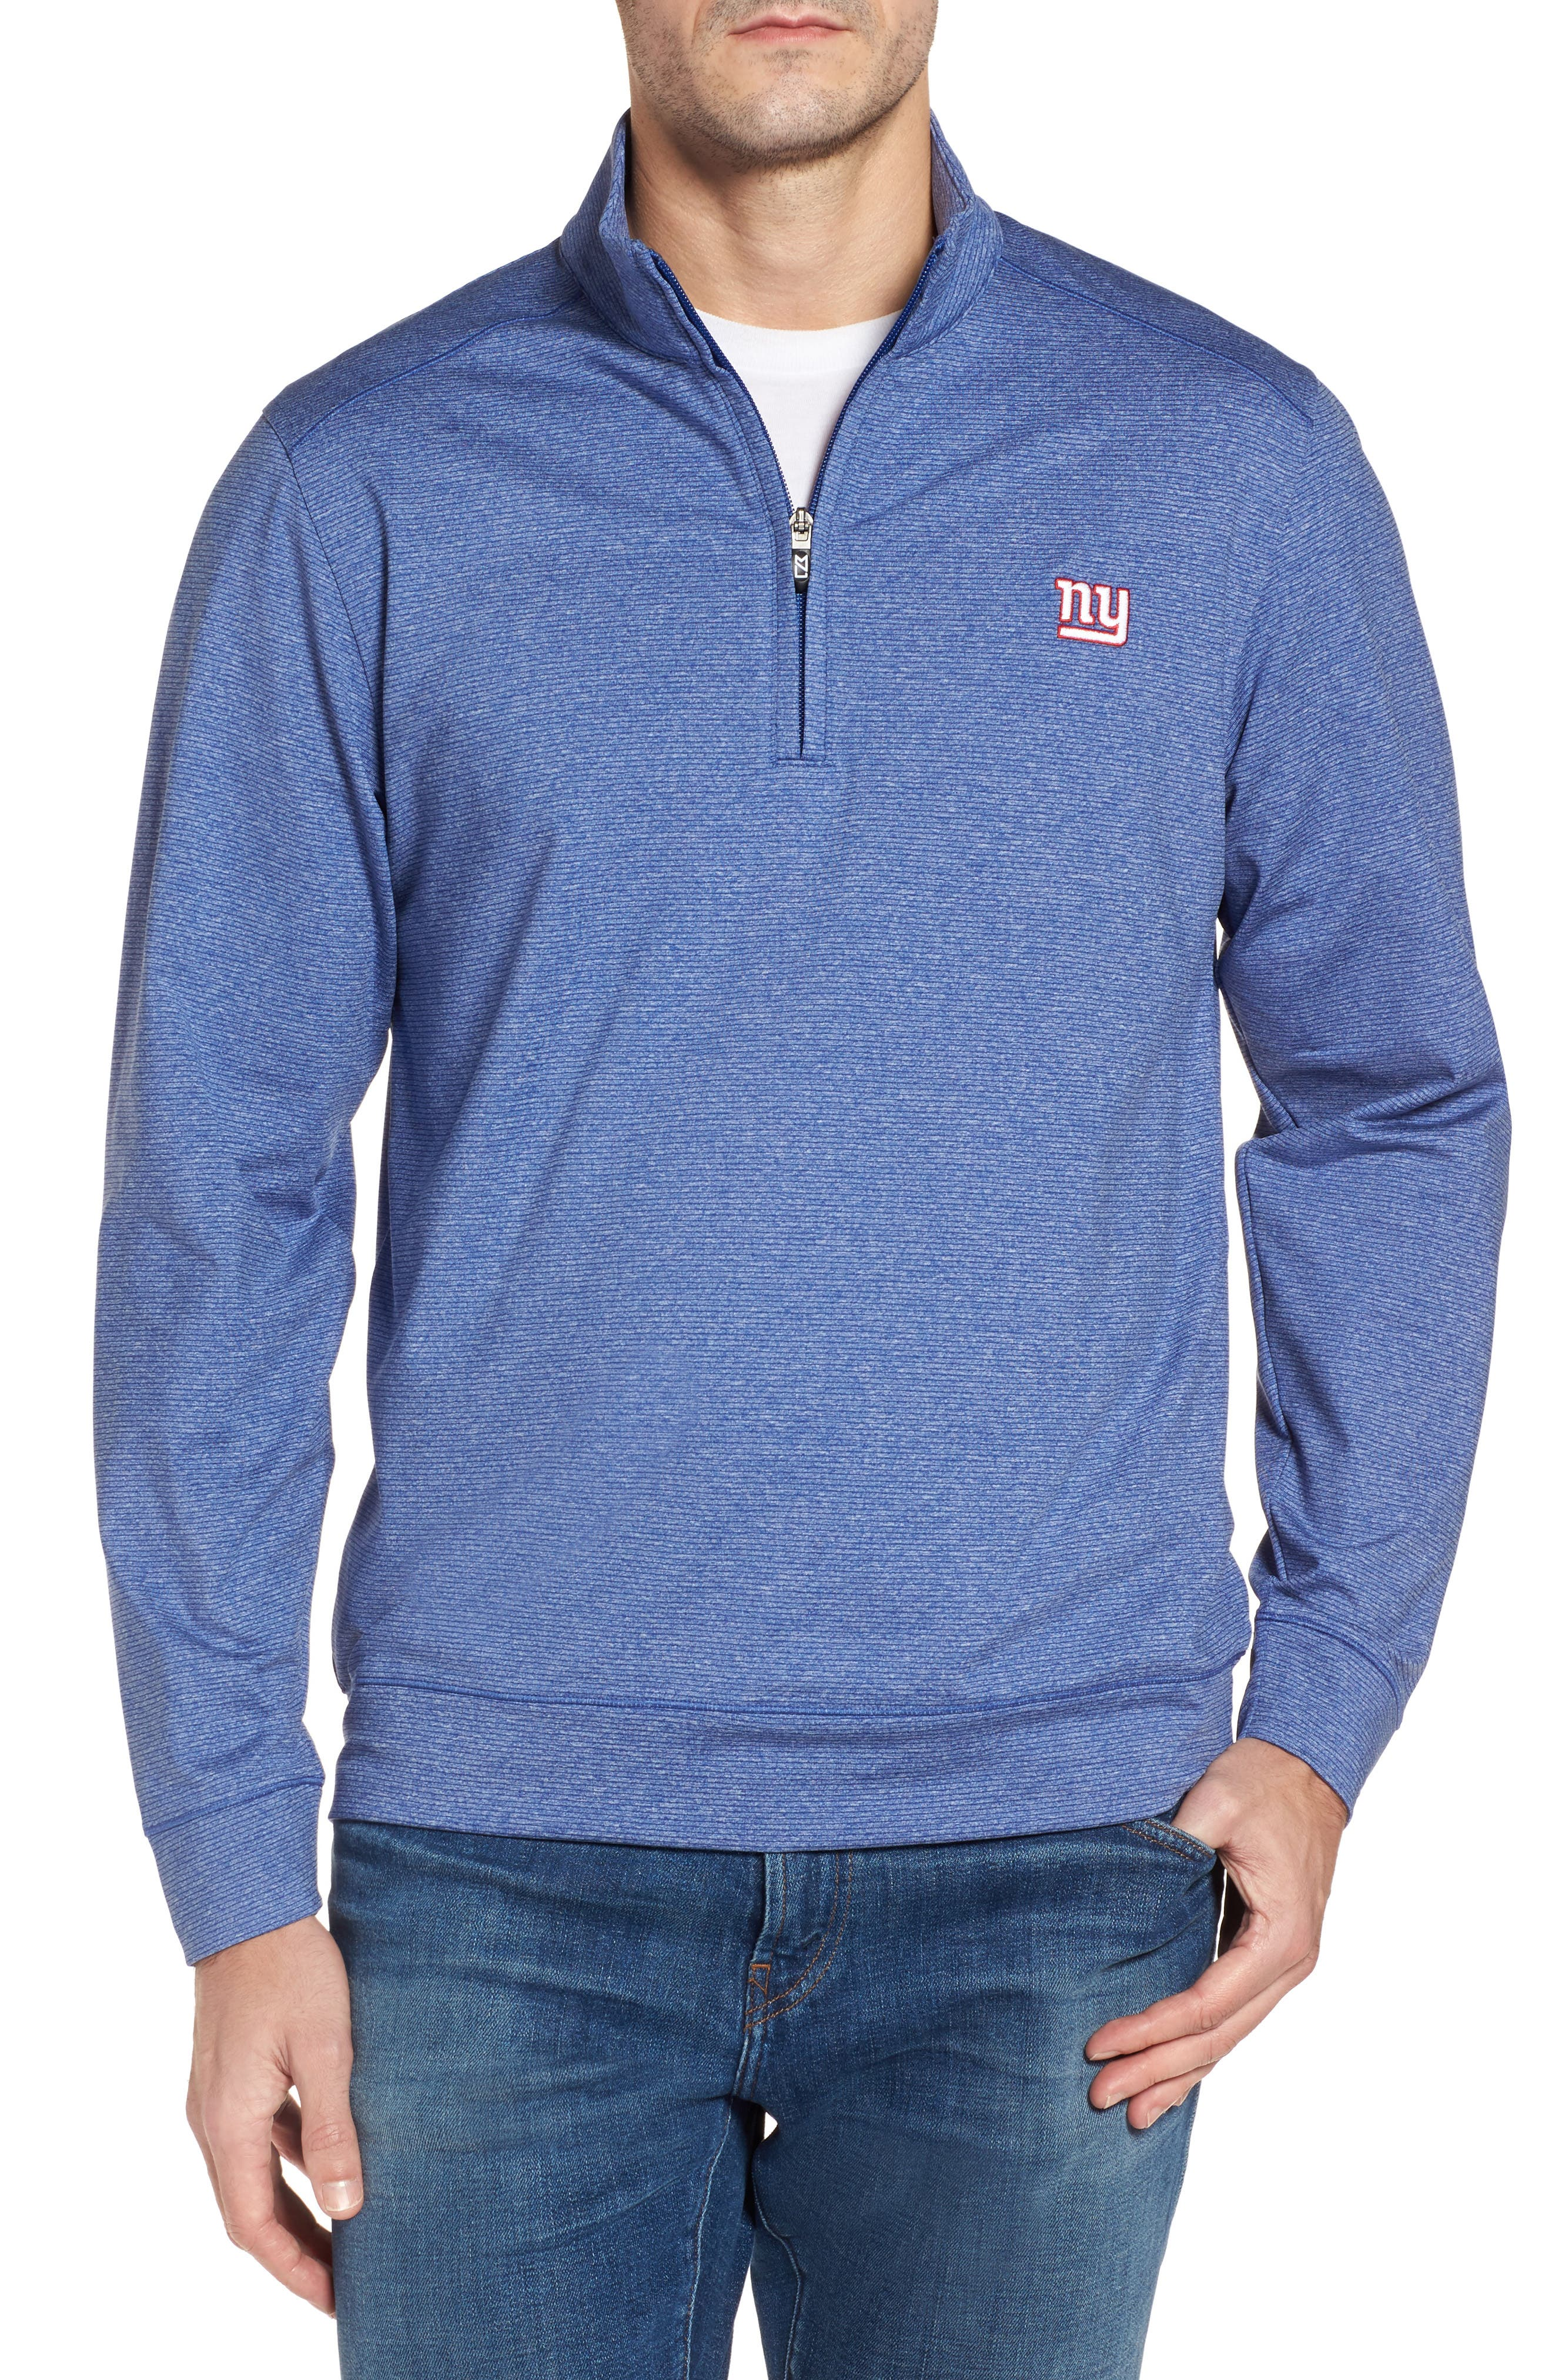 Shoreline - New York Giants Half Zip Pullover,                             Main thumbnail 1, color,                             Tour Blue Heather